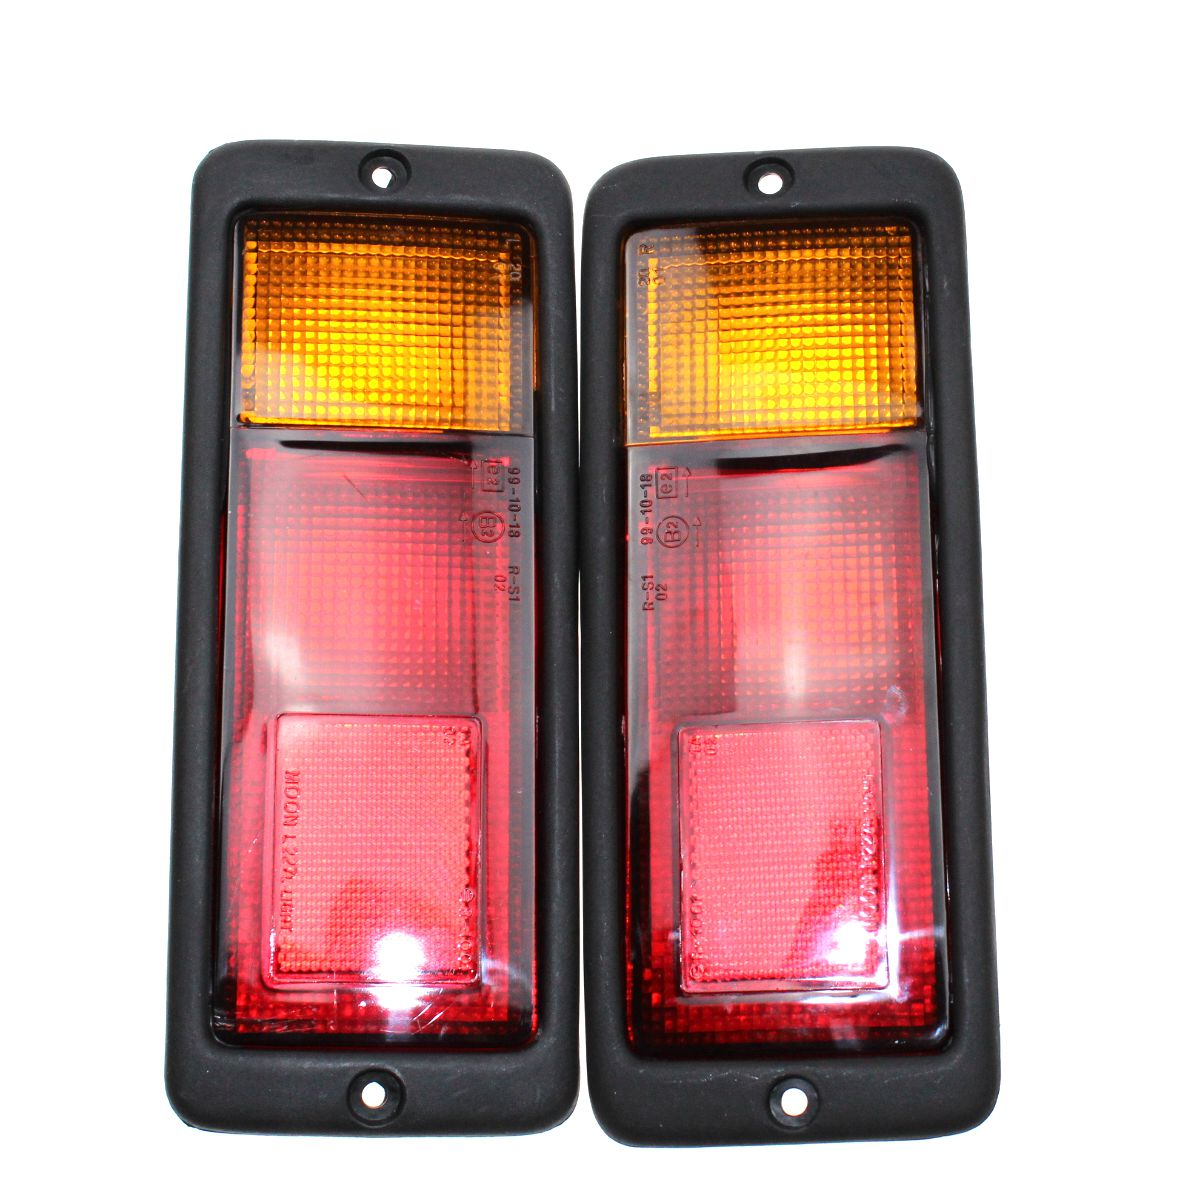 LARBLL Pair New Tail Rear Light Lamp Set Kit LH+RH For Mitsubishi Pajero MONTERO Shogun 91-03 MR124963FC MR124964FC 1 pair lh